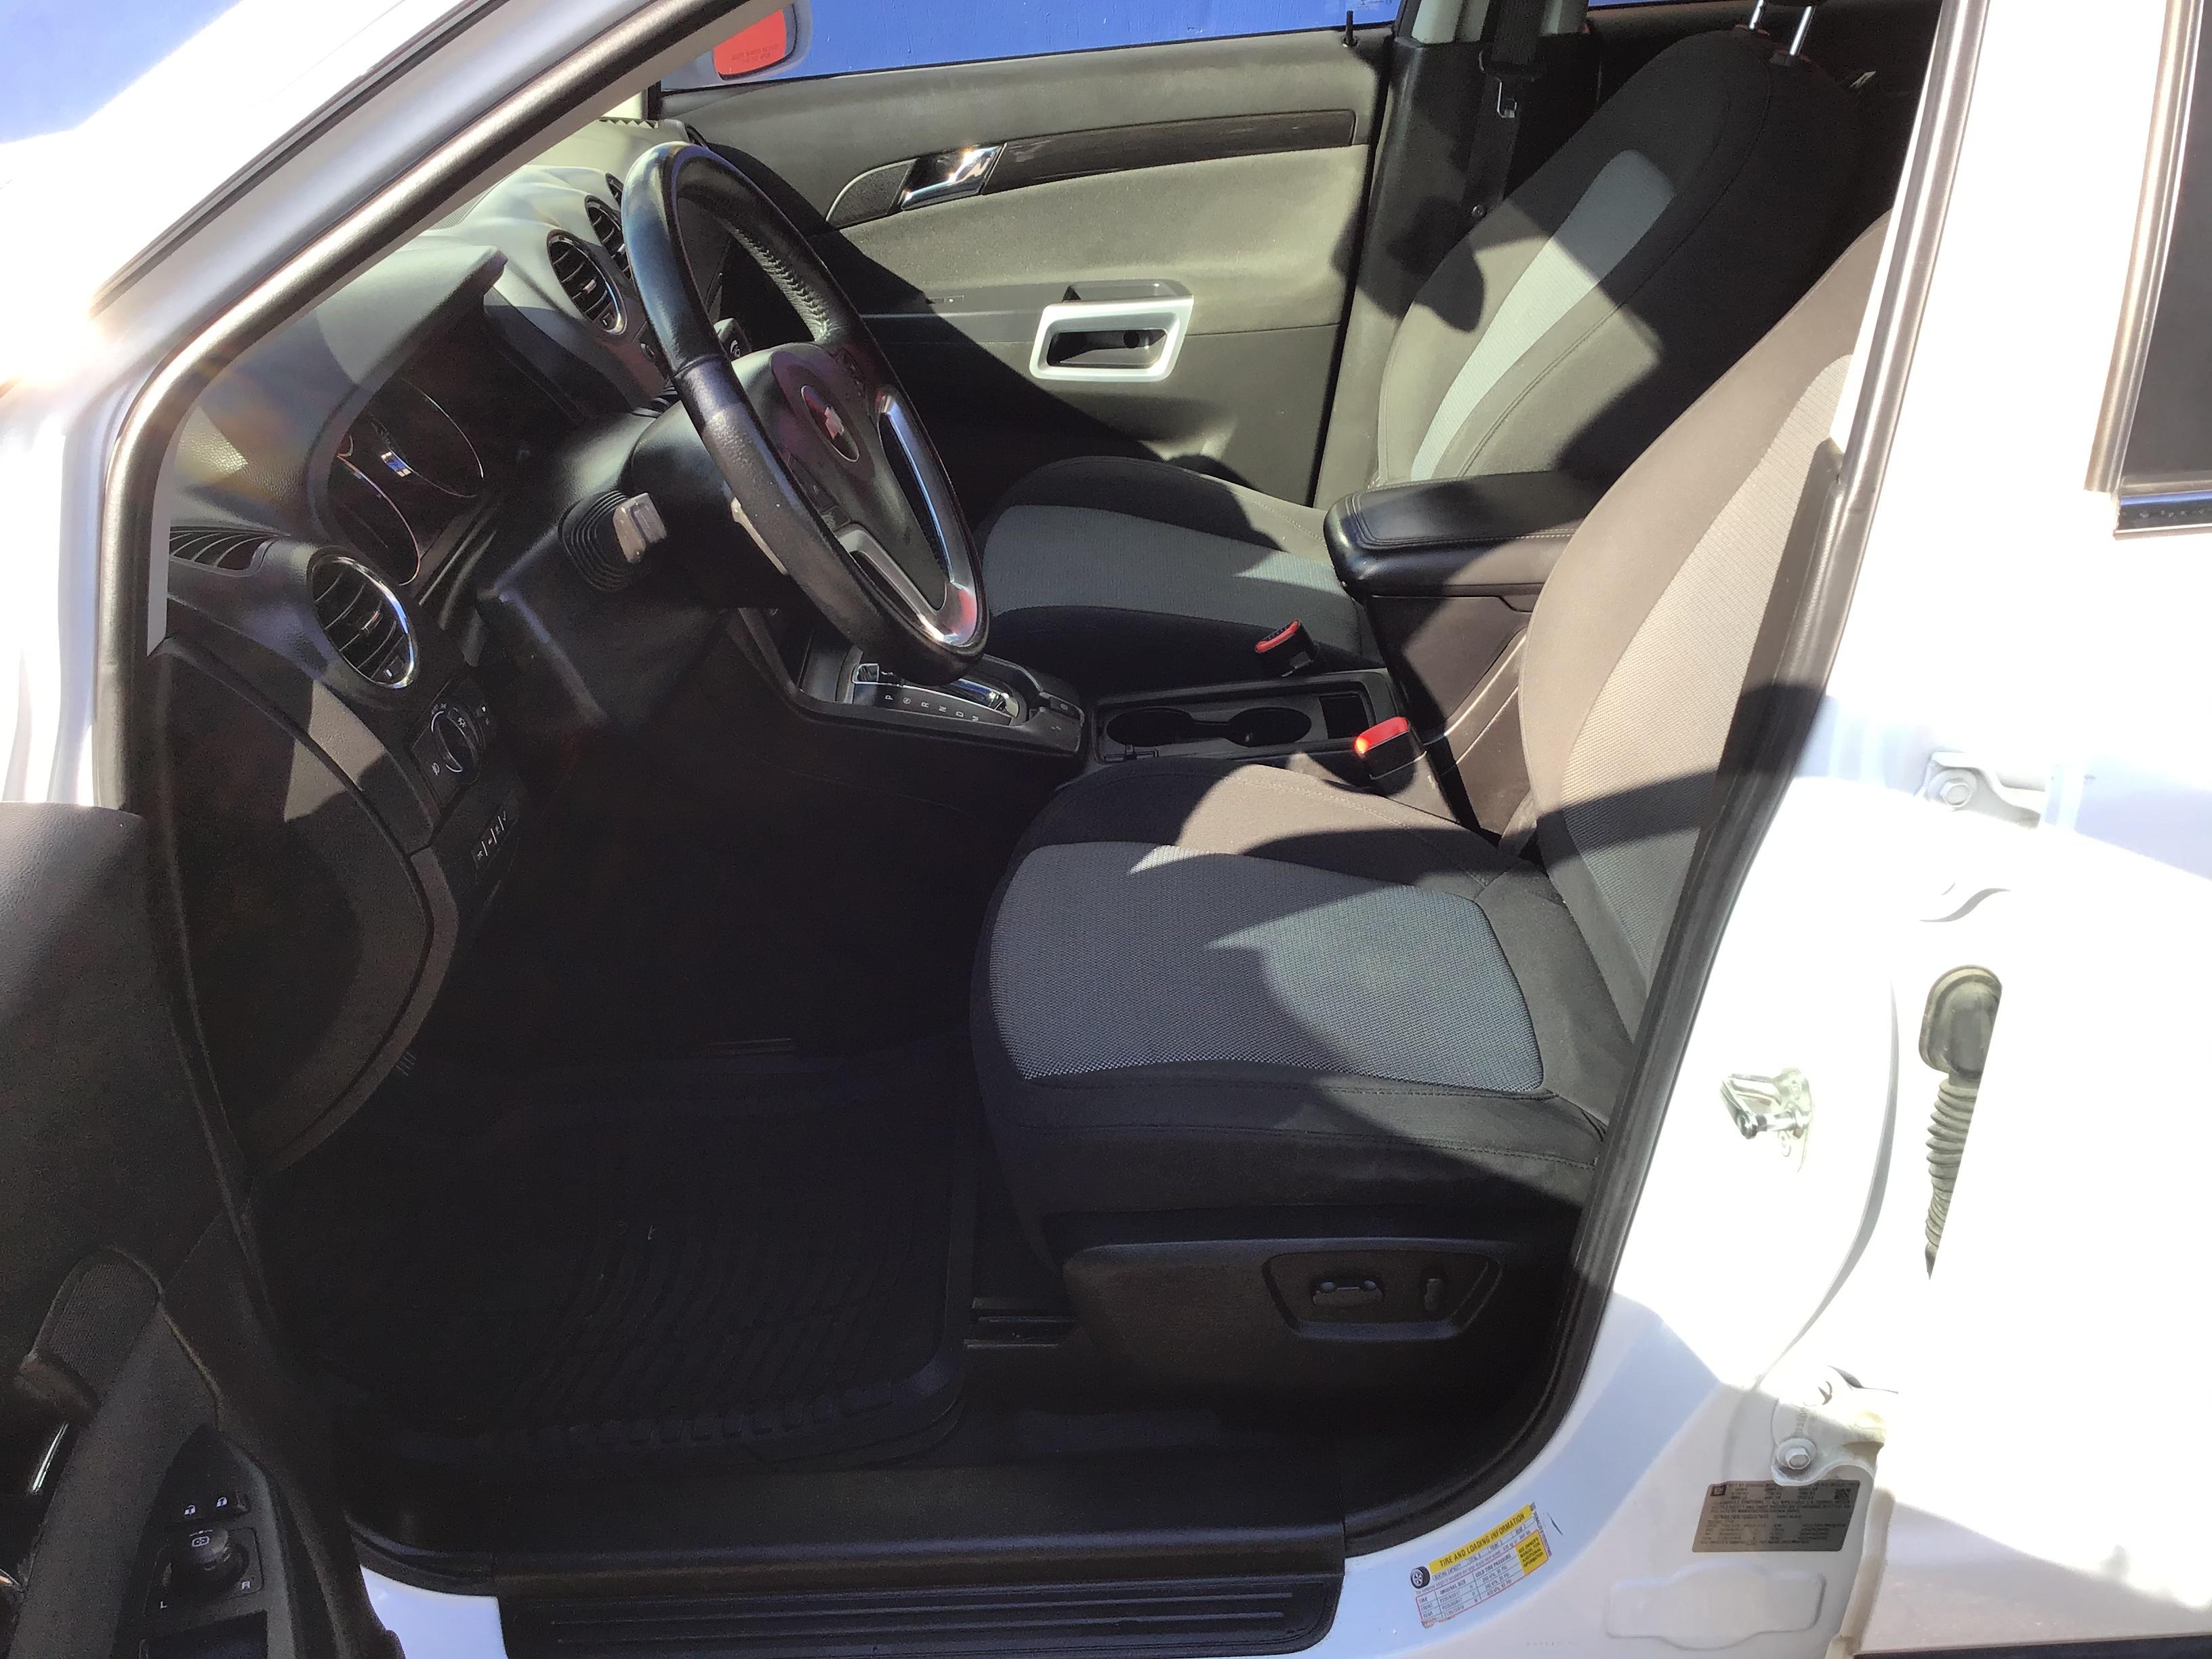 used vehicle - SUV CHEVROLET CAPTIVA SPORT FLEET 2013